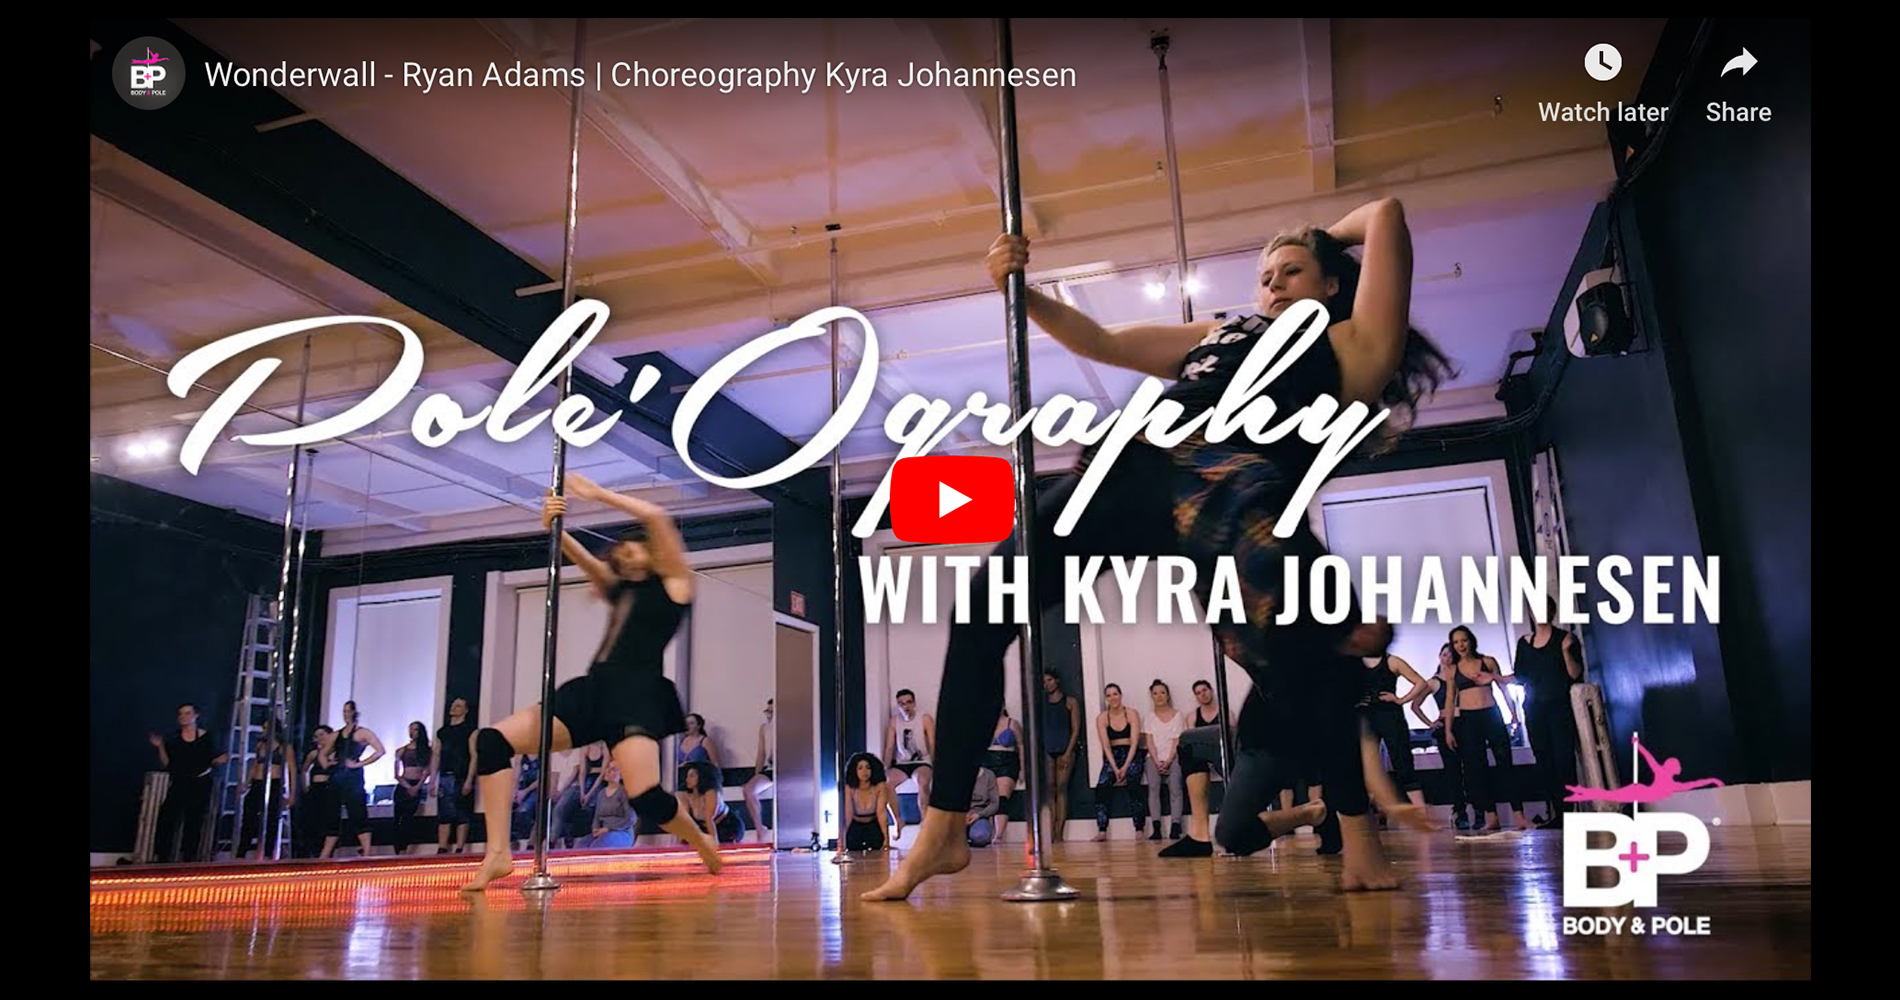 Wonderwall – Ryan Adams | Choreography Kyra Johannesen